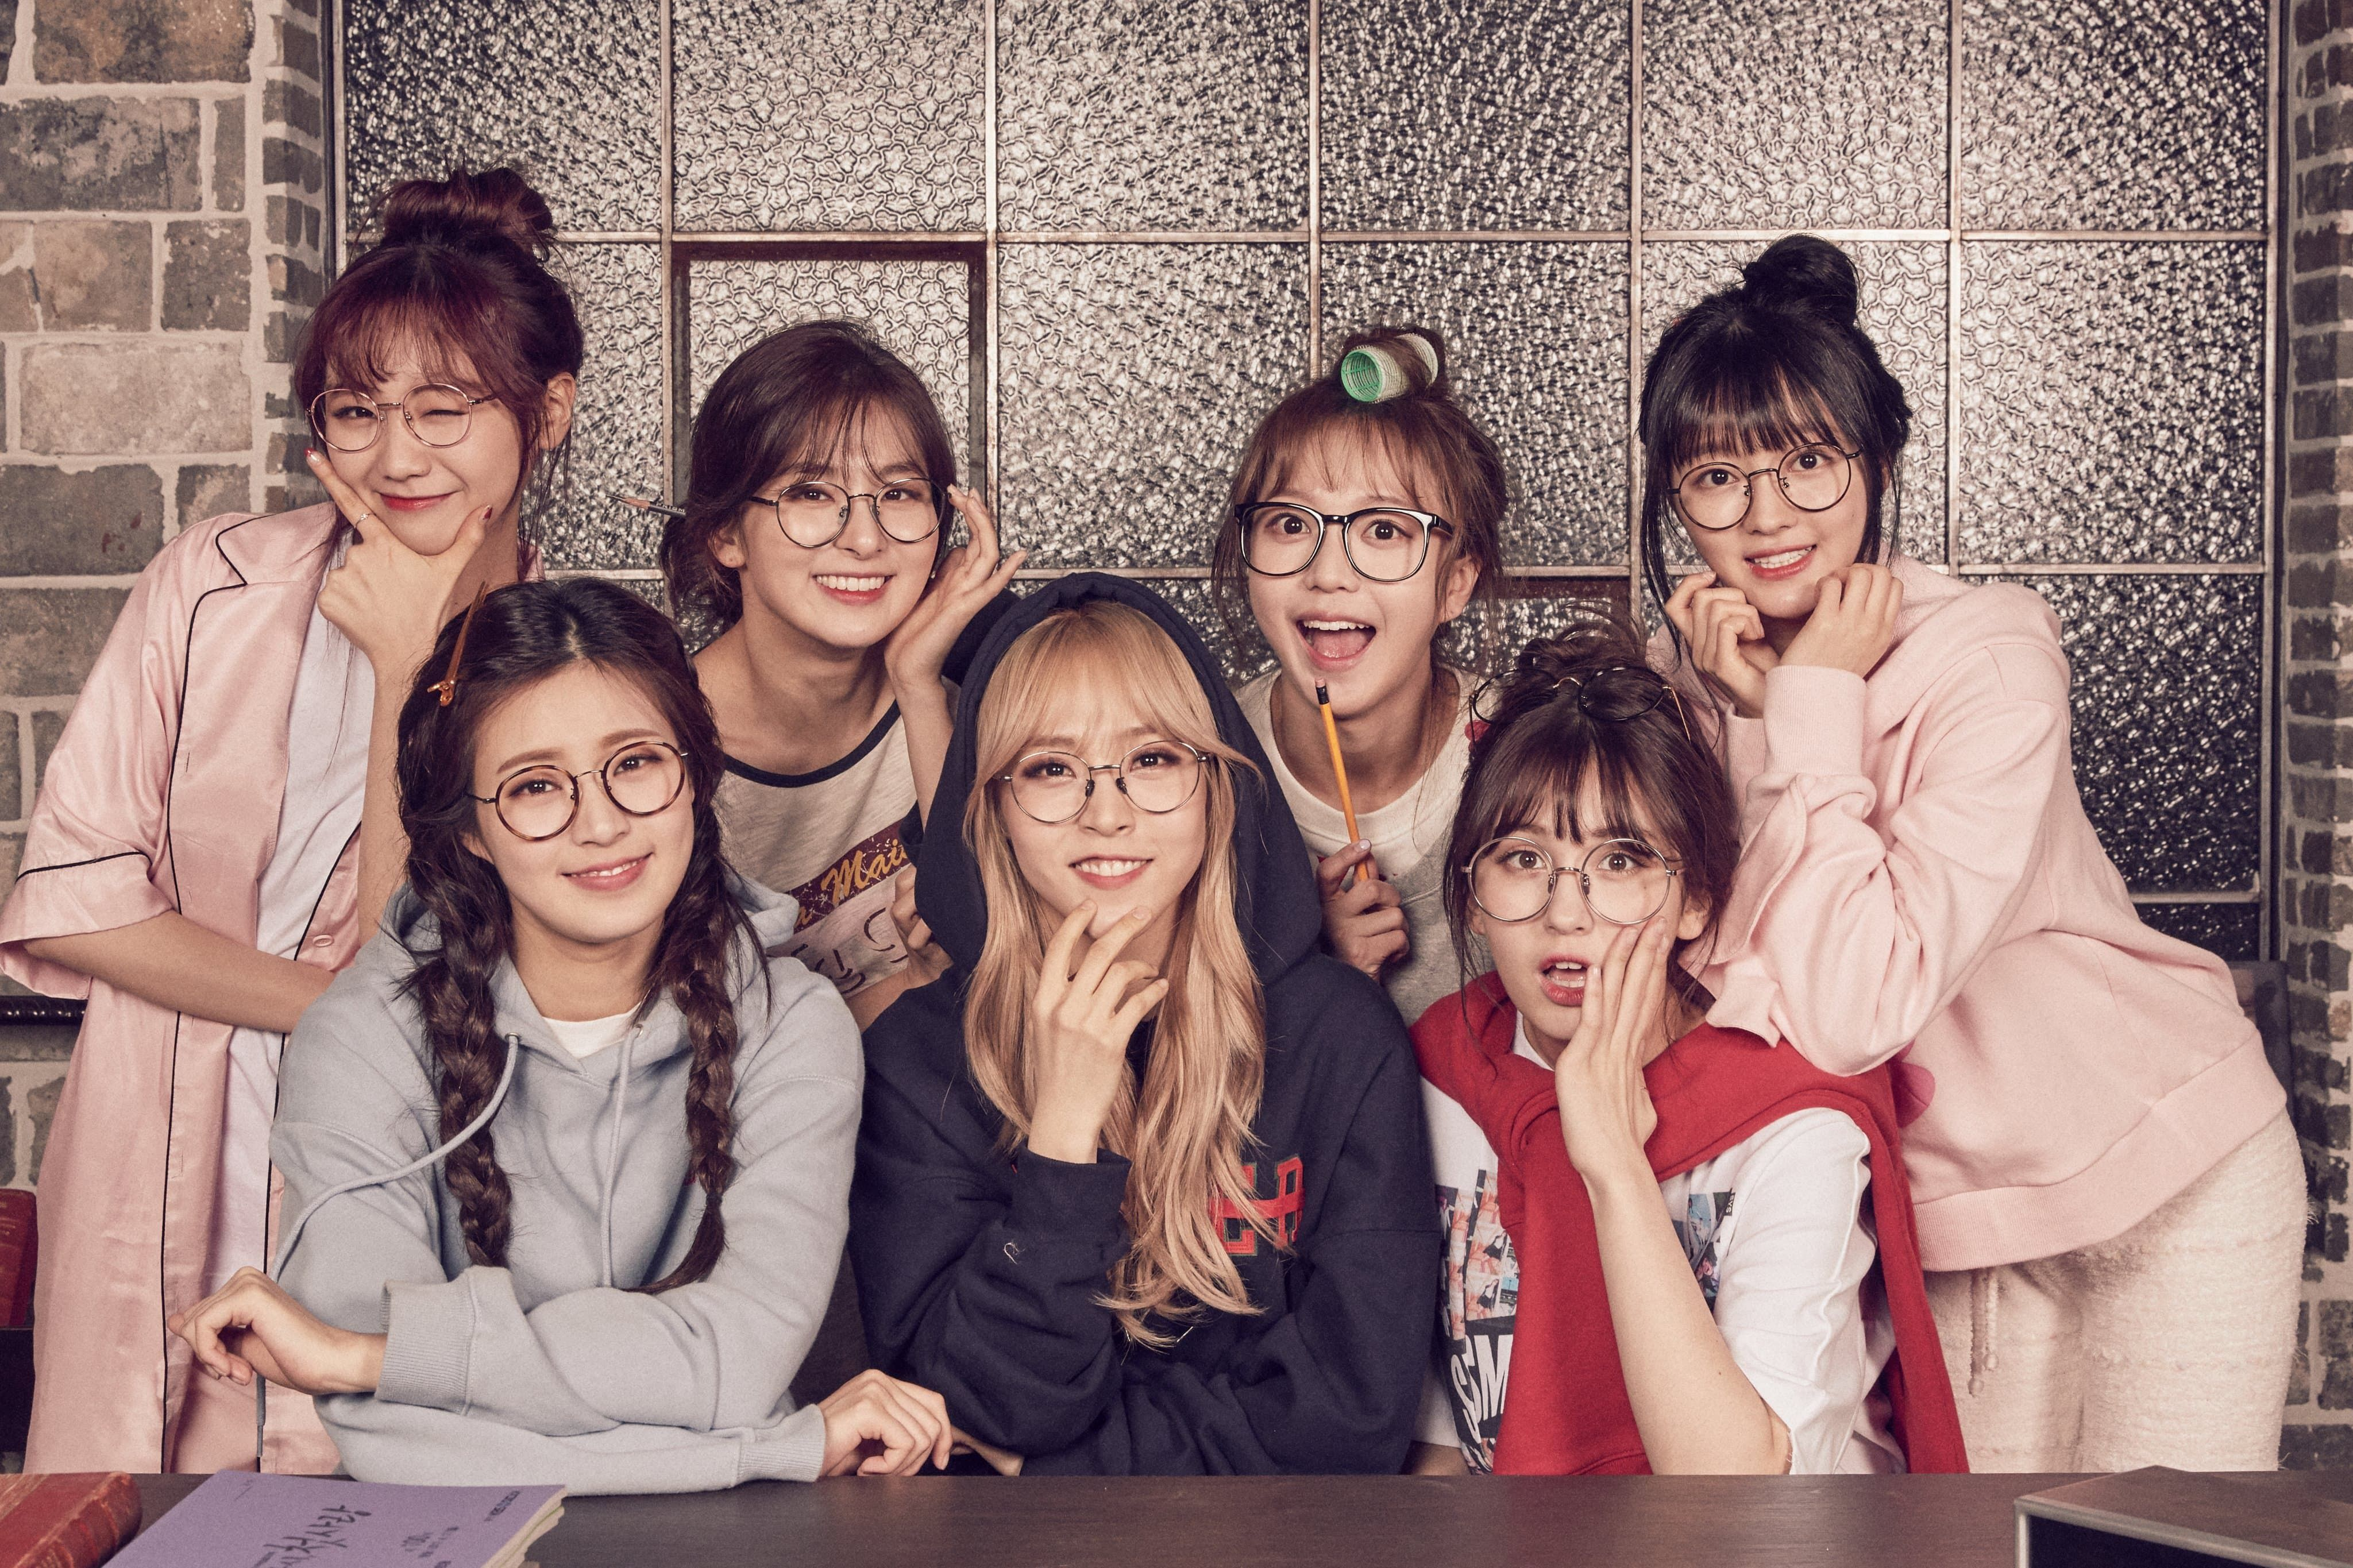 Idol Drama Operation Team Cast Photo Seulgi Somi Moonbyul Yooa Sujeong Sohee And D Ana Kpics Kpop Sweetgirls Lovethe Moonbyul Girl Group Pictures Mamamoo